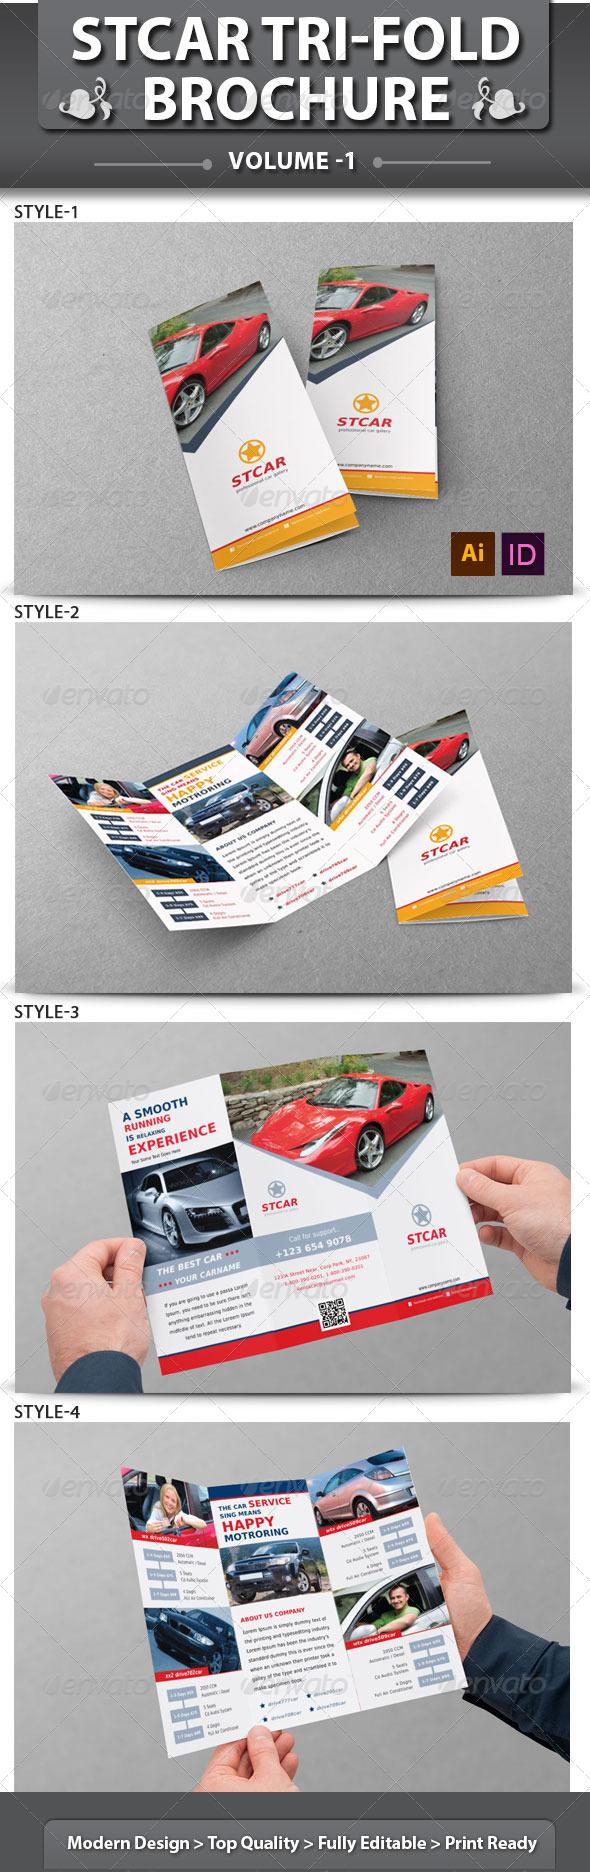 GraphicRiver Stcar TriFold Brochure v1 5856200